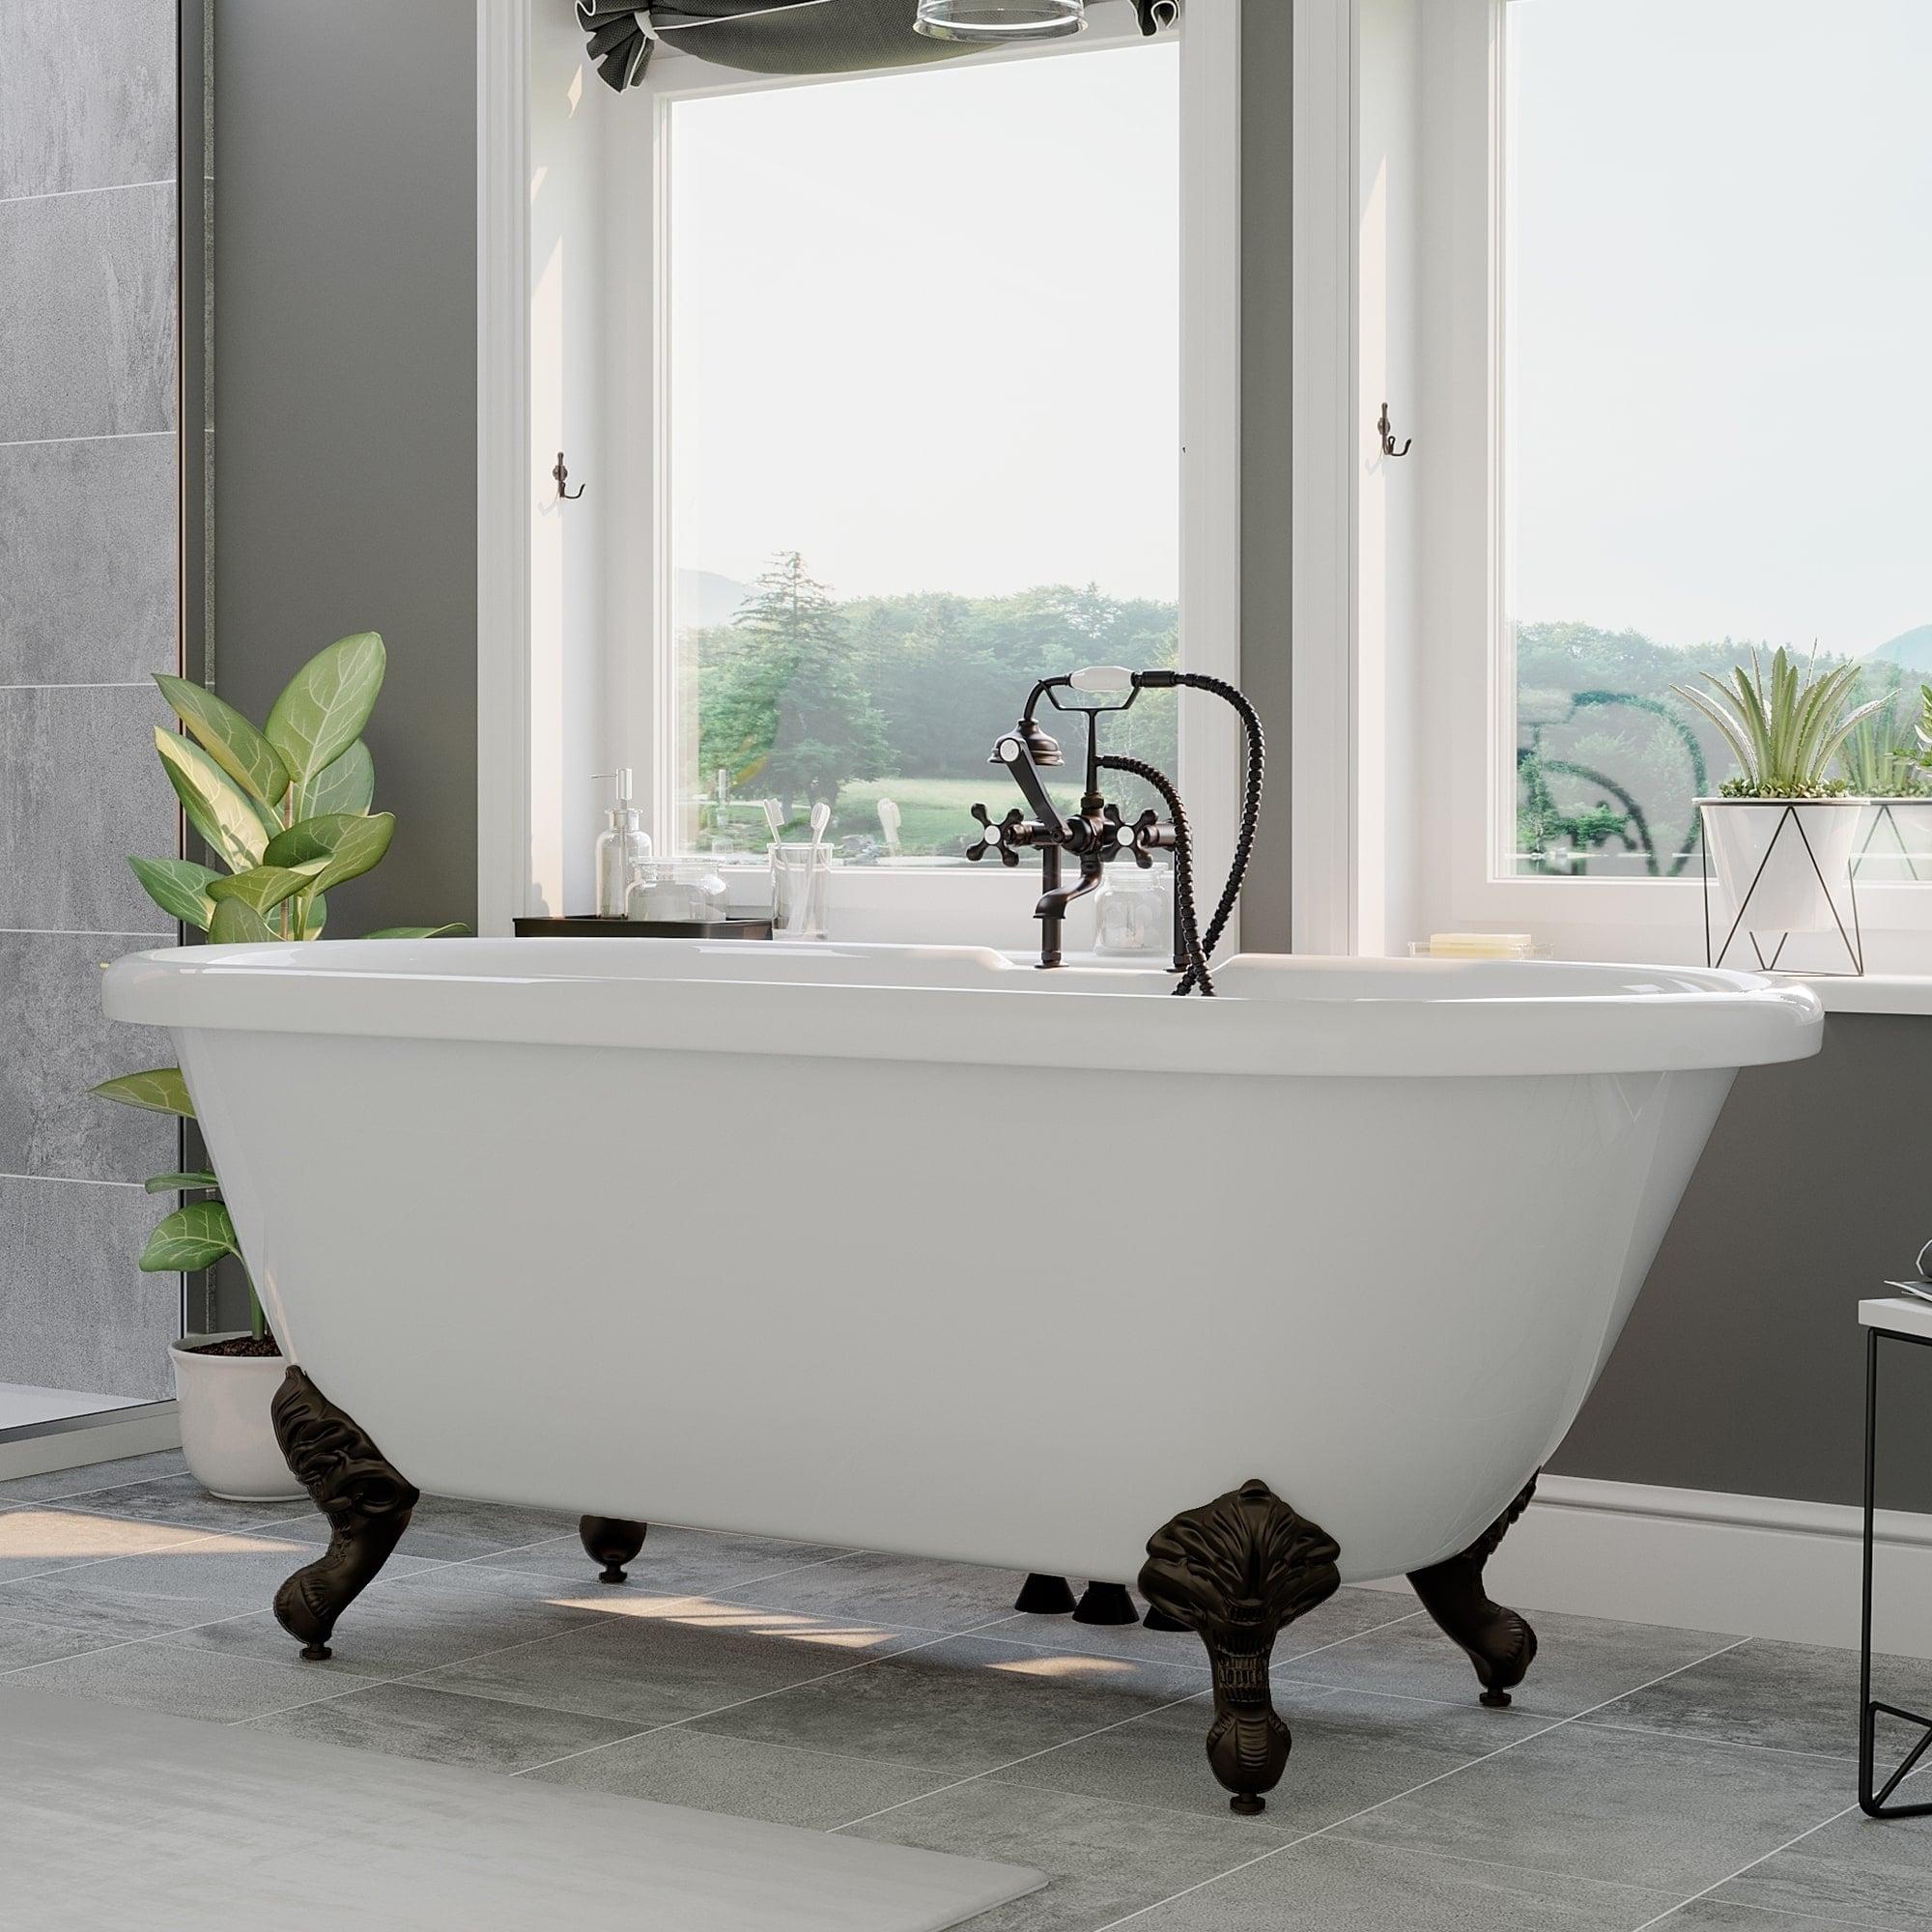 Acrylic Double Ended Clawfoot Bathtub 60 X 29 Deck Holes